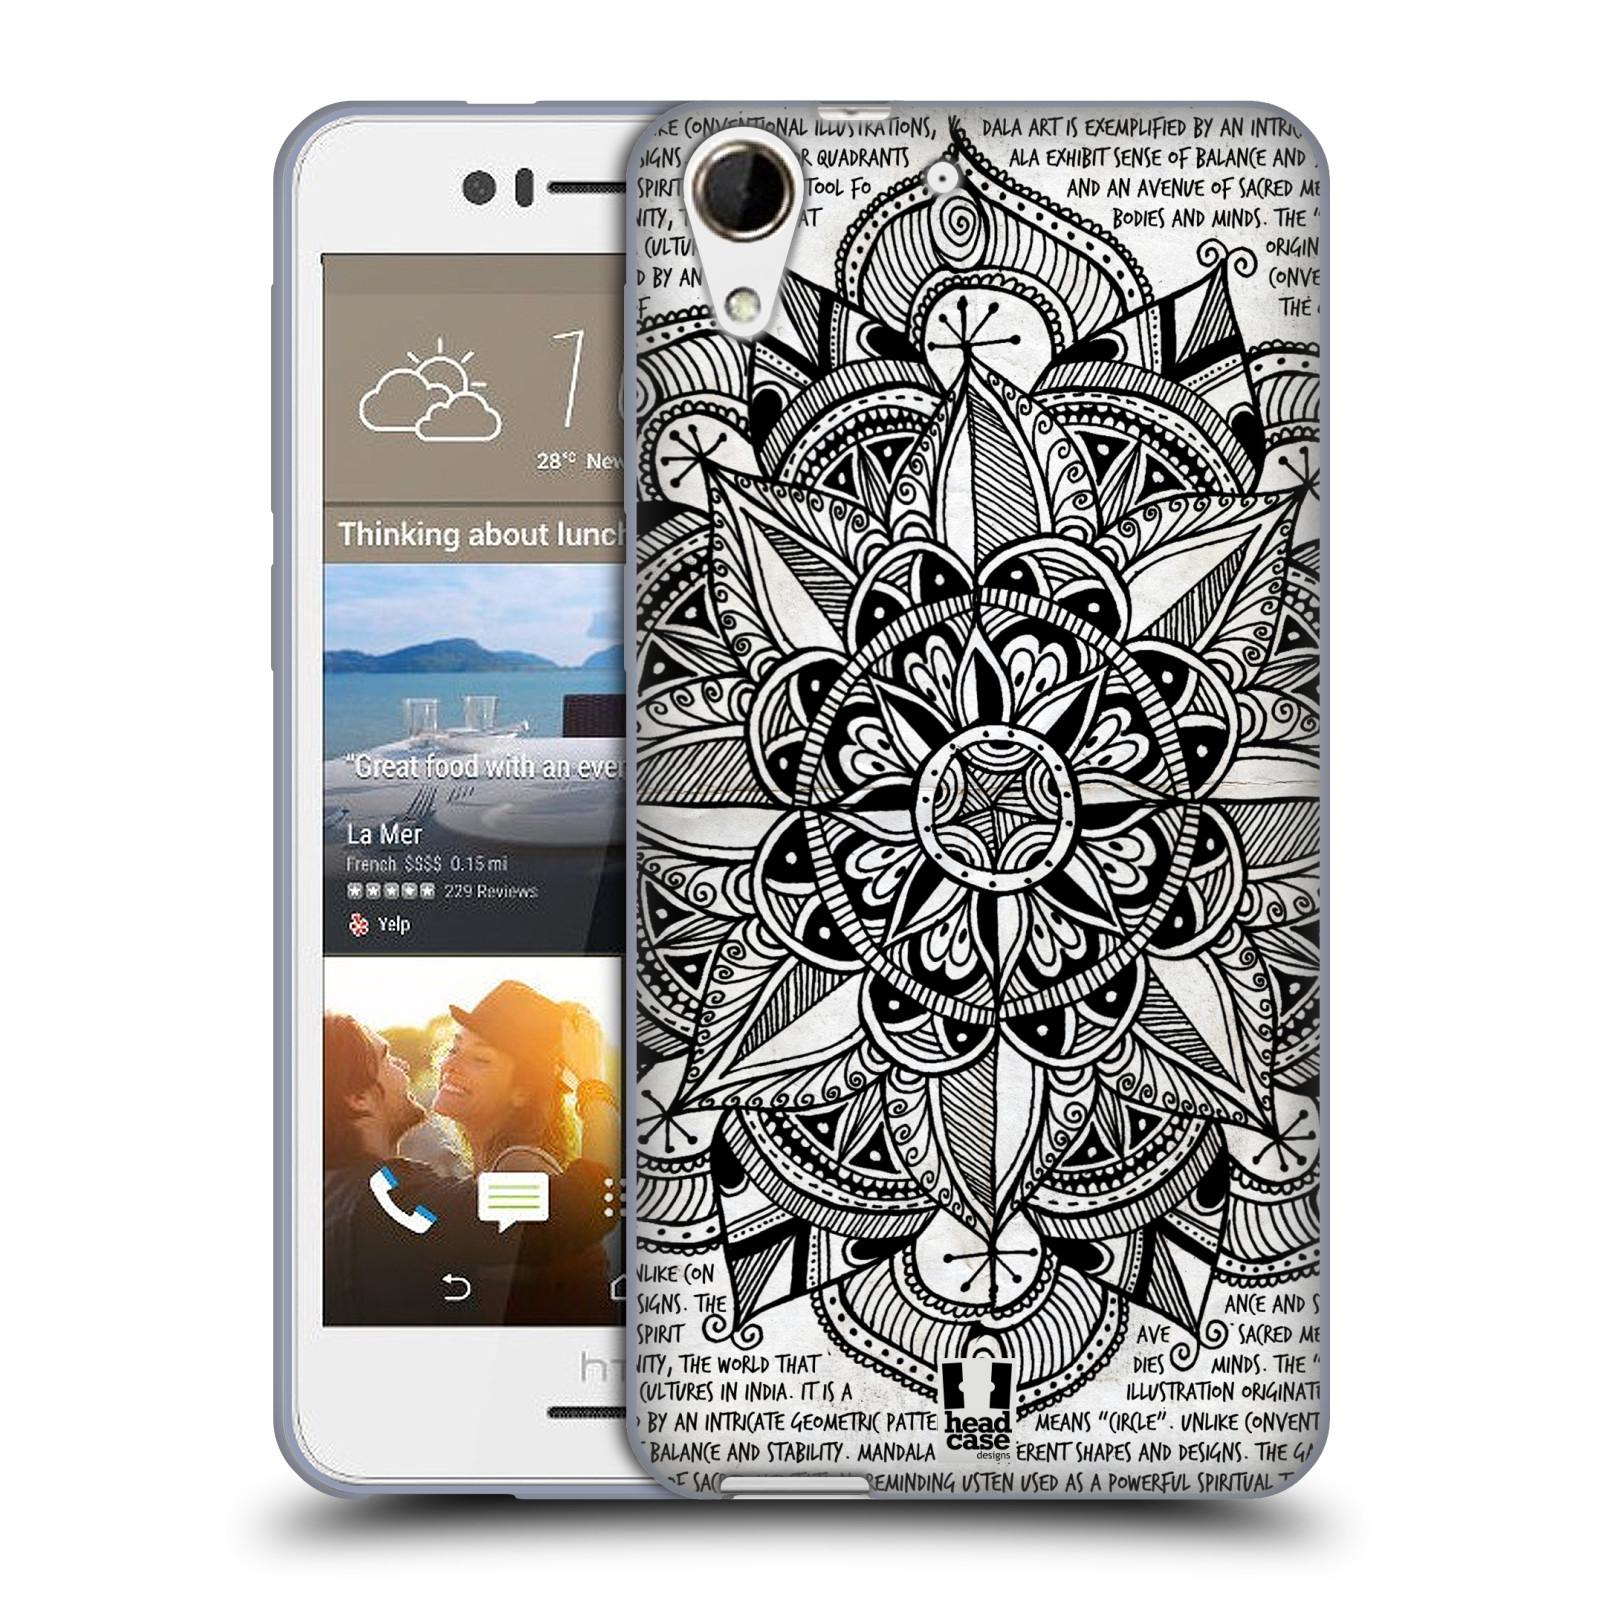 Silikonové pouzdro na mobil HTC Desire 728G Dual SIM HEAD CASE Mandala Doodle Paper (Silikonový kryt či obal na mobilní telefon HTC Desire 728 G Dual SIM)